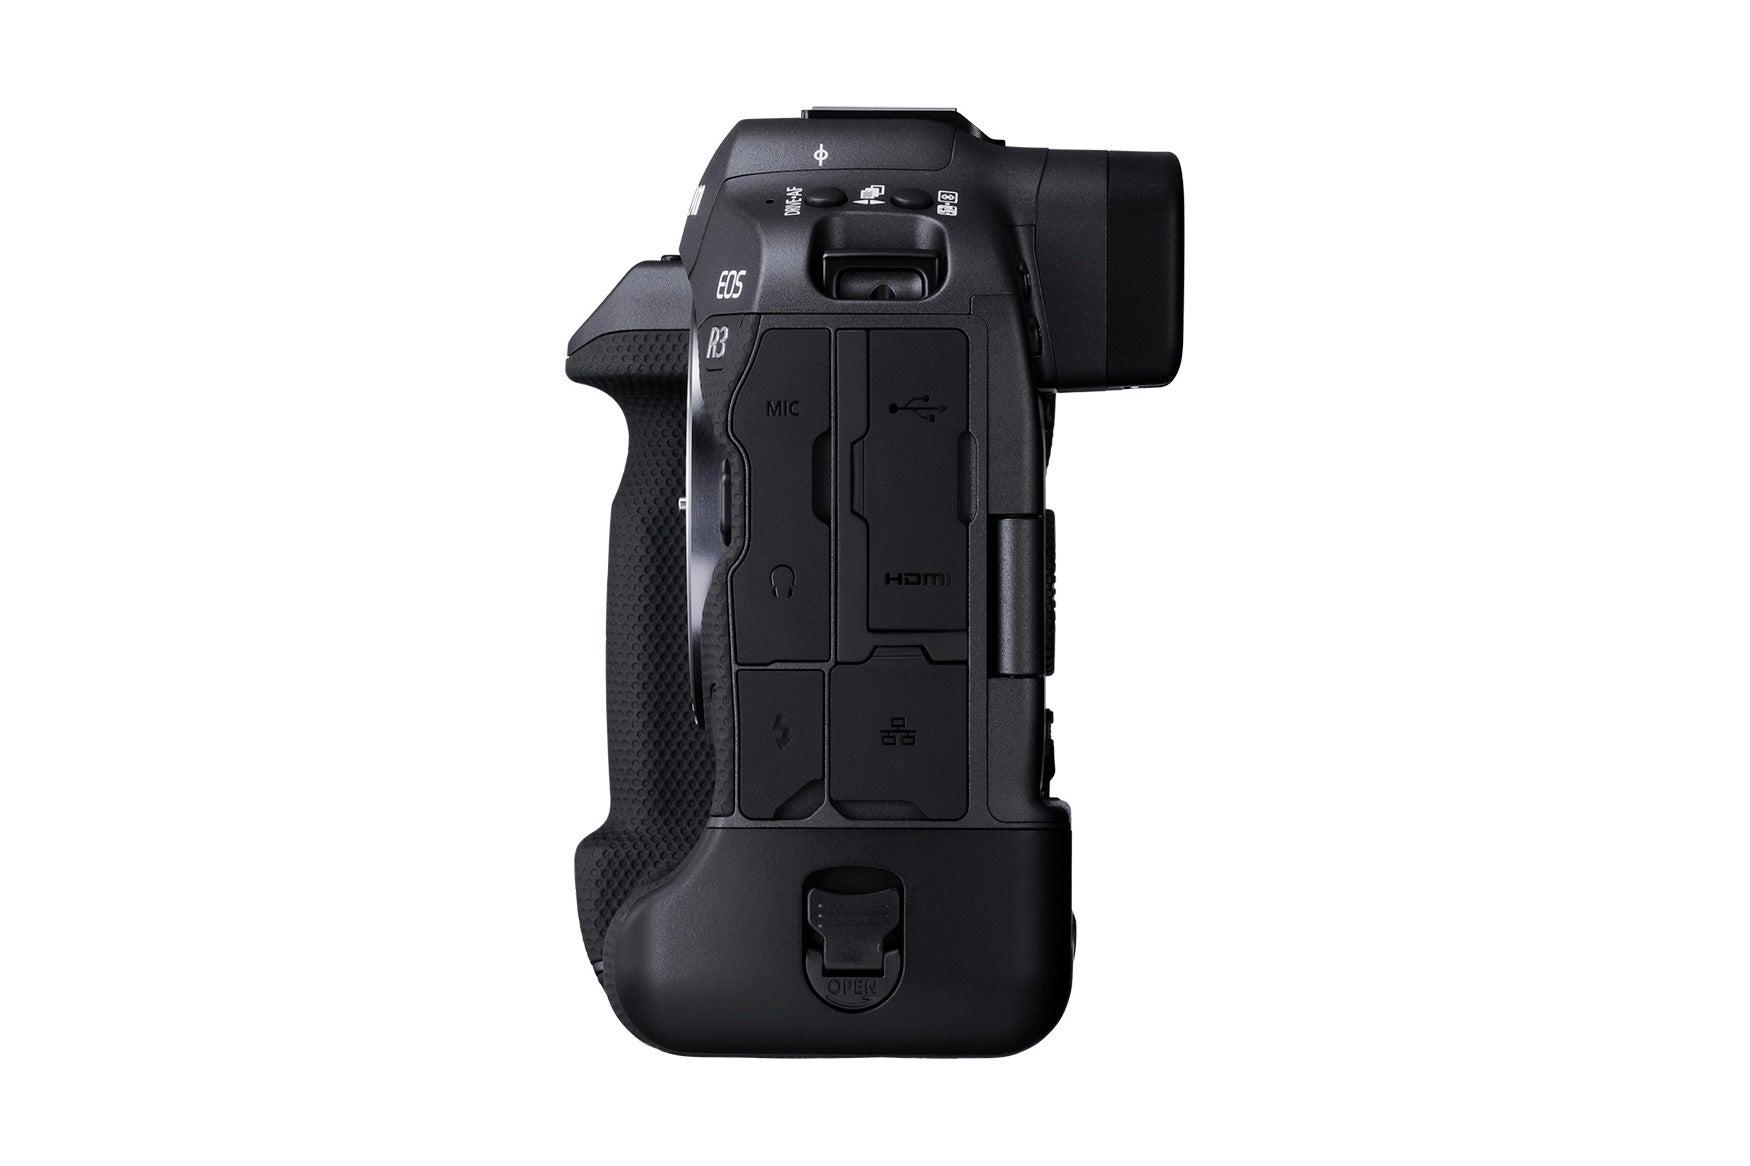 Canon EOS R3 mirrorless camera side